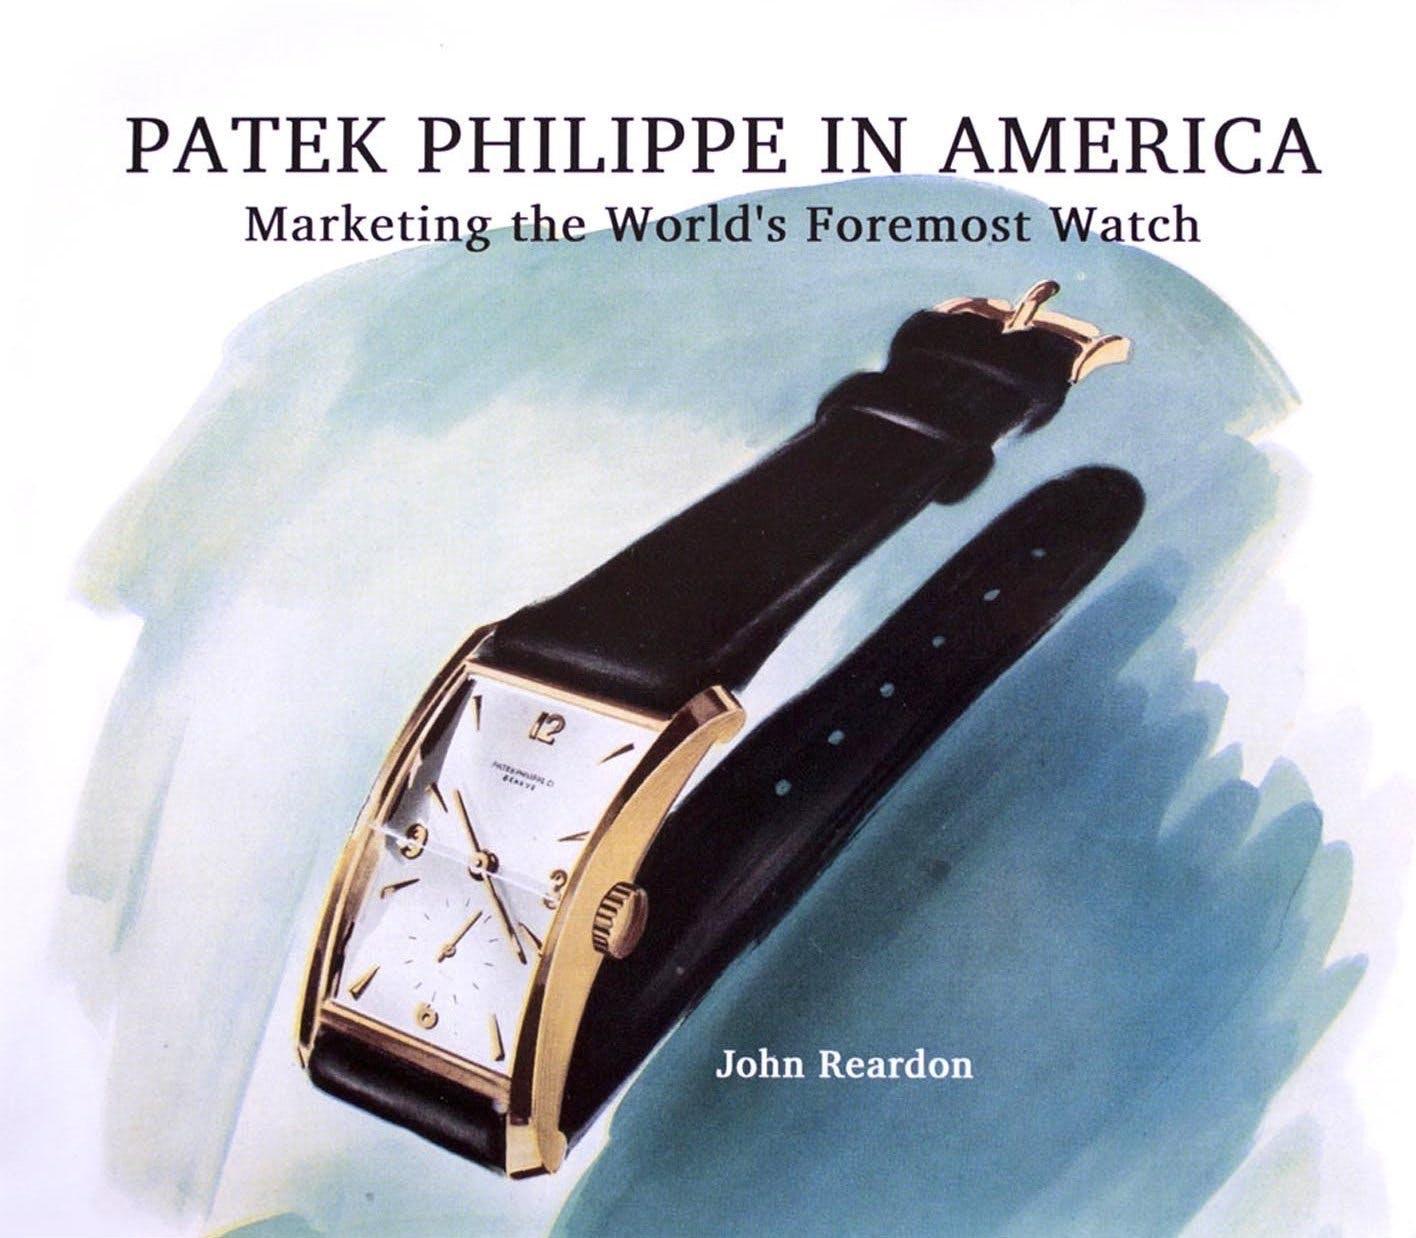 Patek Philippe in America